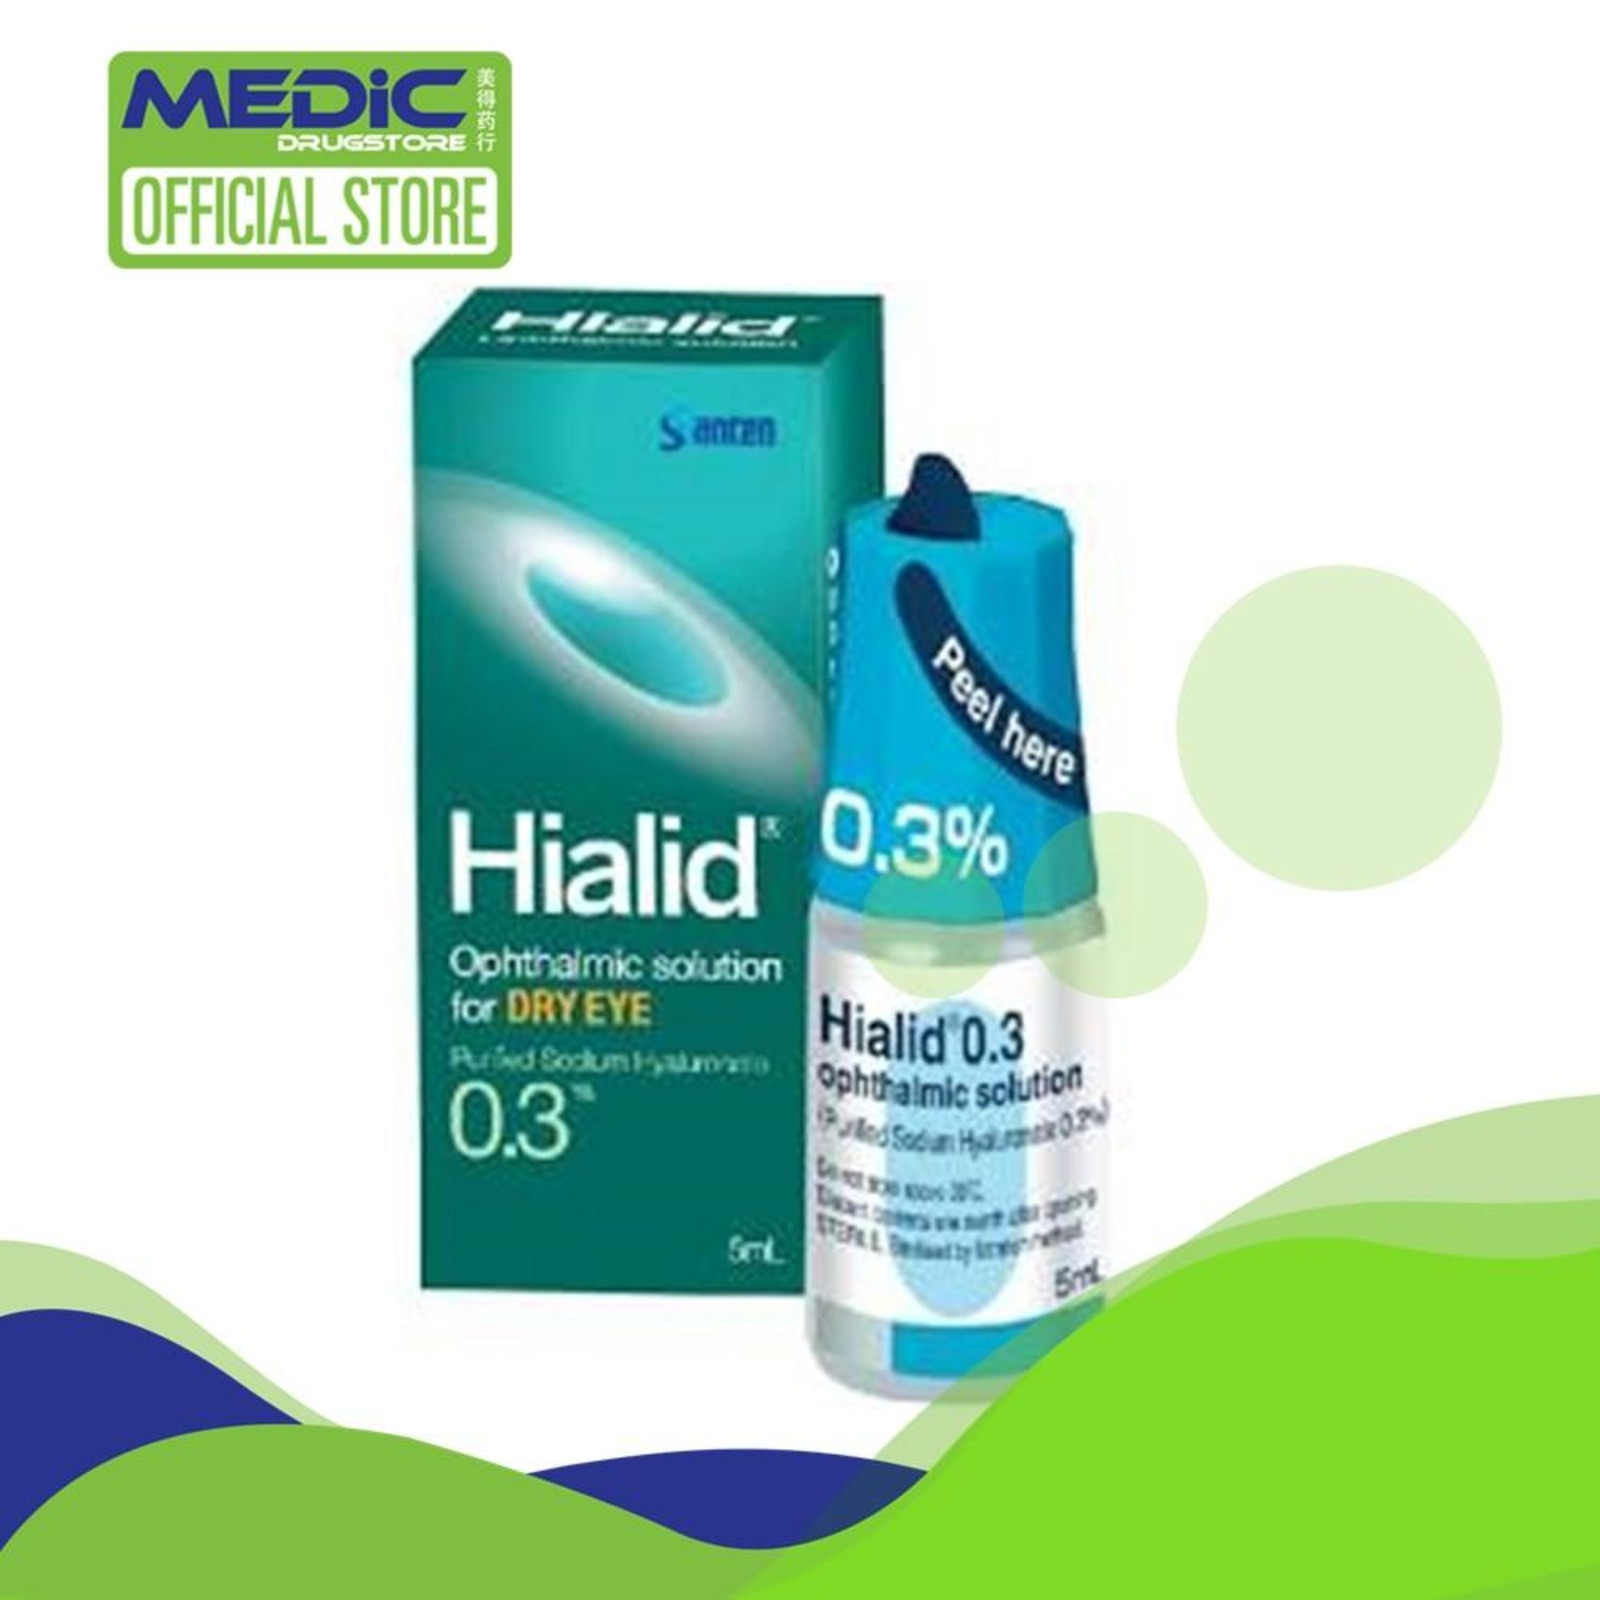 Santen Hialid 0.3 Ophthalmic Solution Eye Drop 5ml